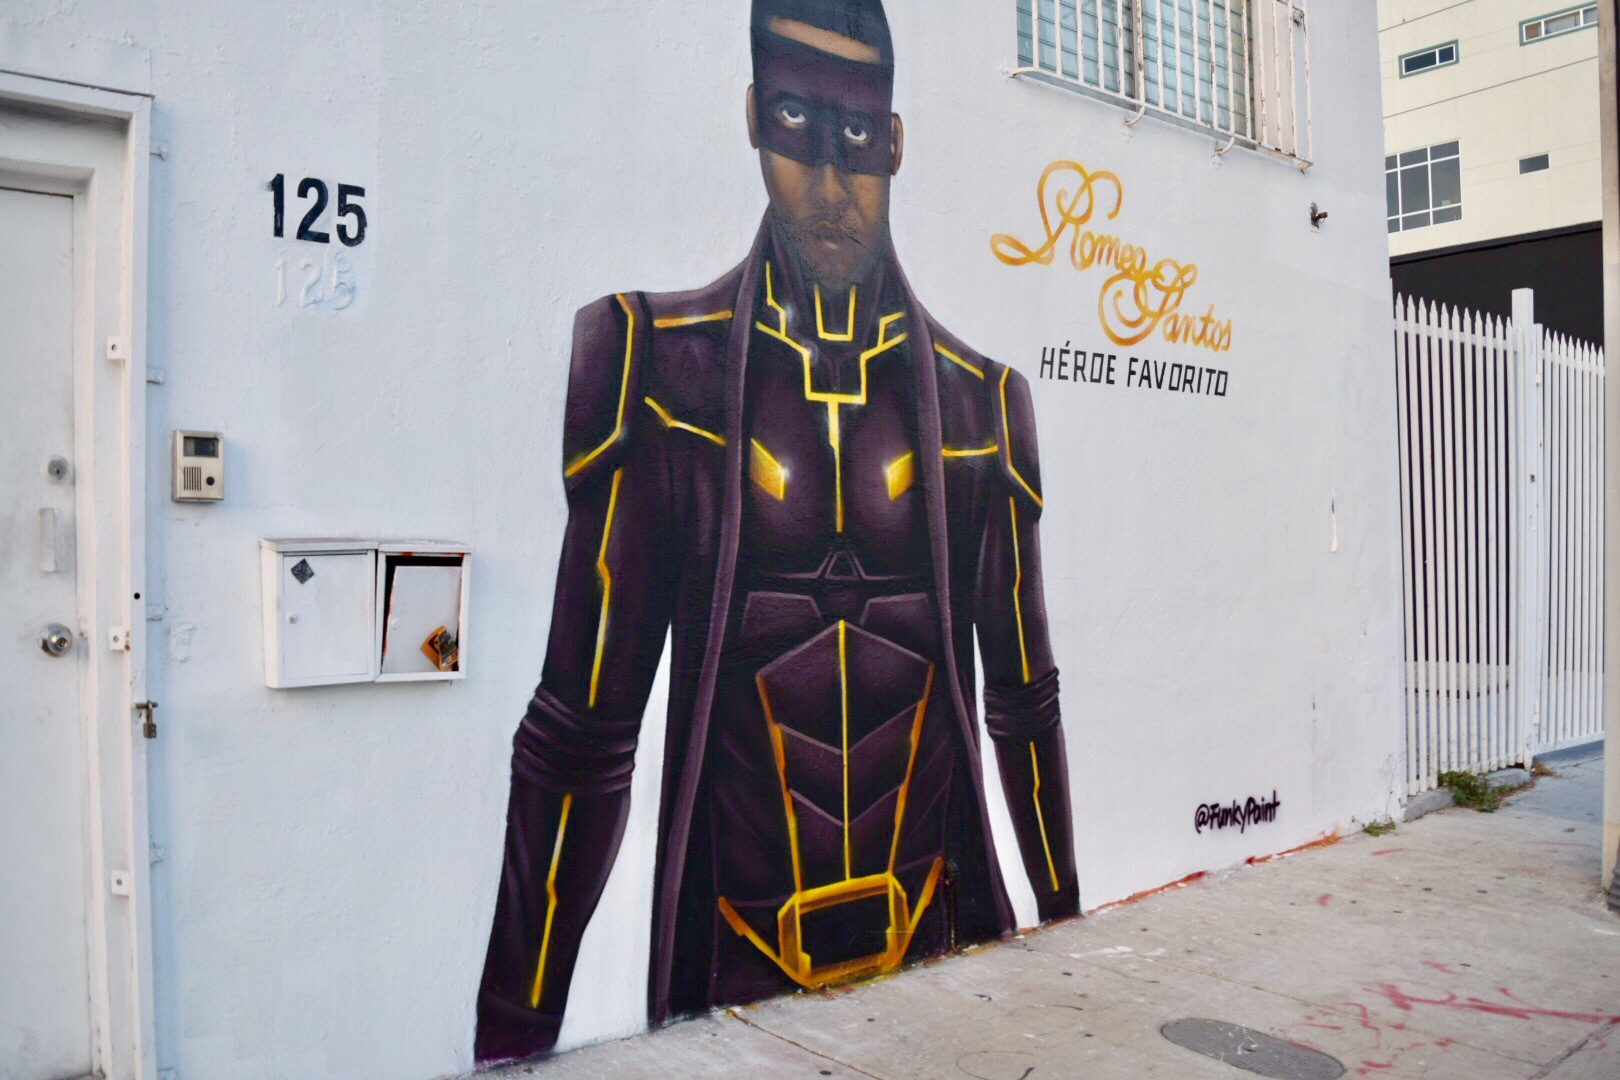 Sony Latin Mural - Romeo Santos